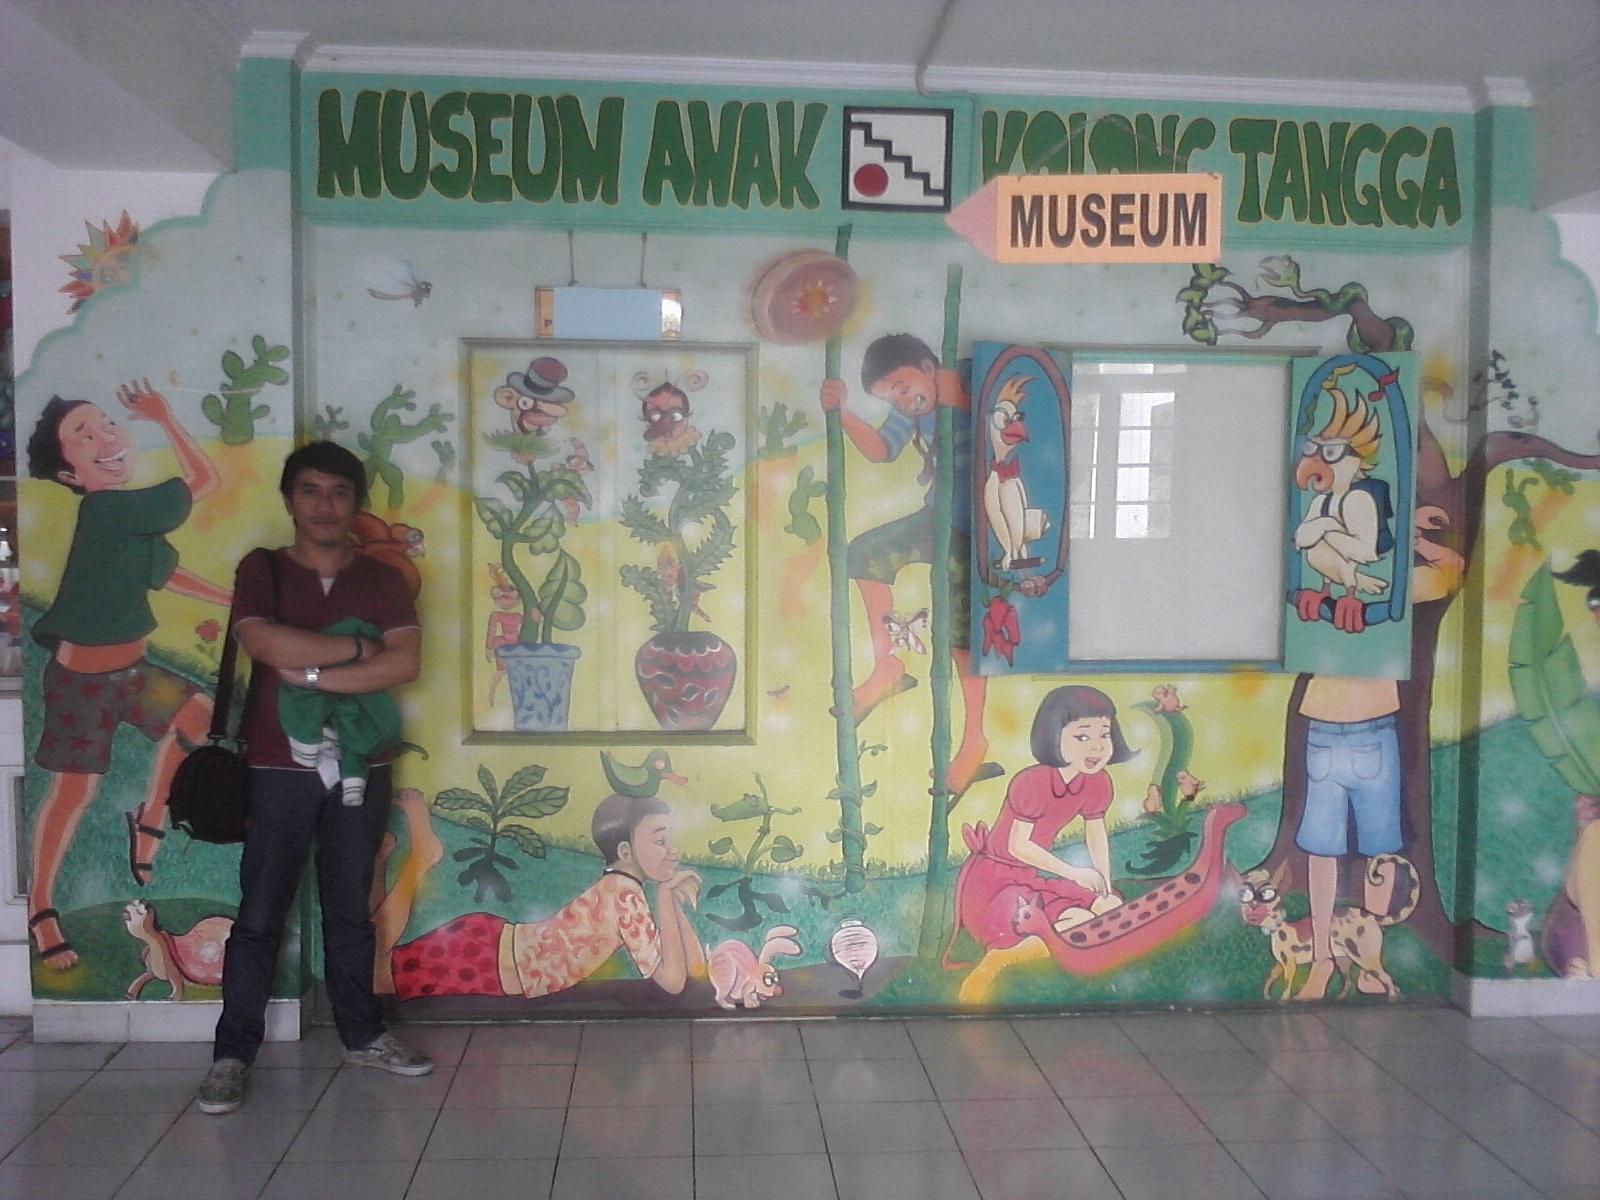 Brahma Adjie Jalan Jogja Museums Review Depan Museum Anak Kolong